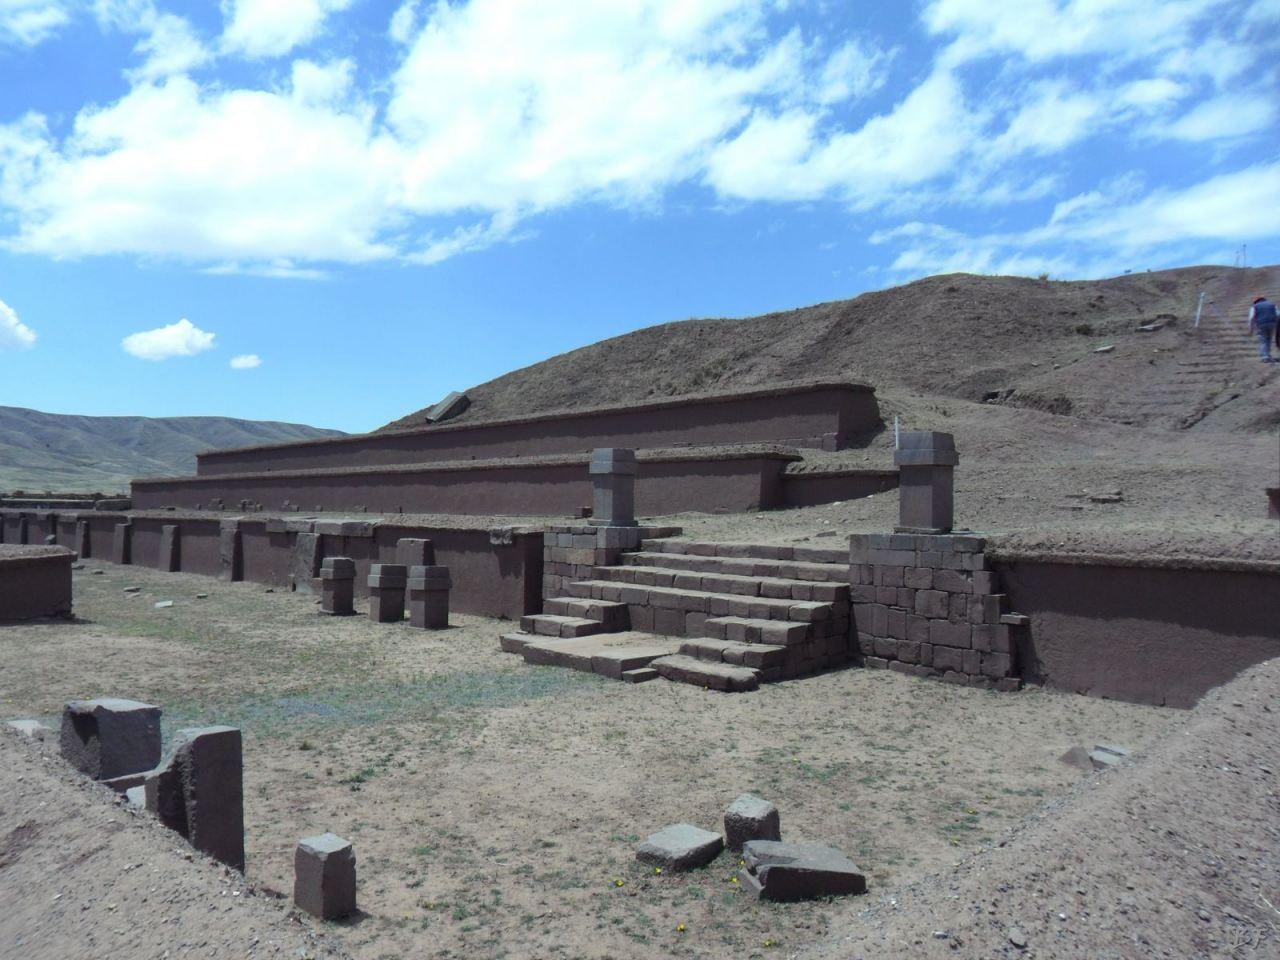 Sito-Megalitico-Piramide-Akapana-Kalasasaya-Menhir-Tiahuanaco-Bolivia-138